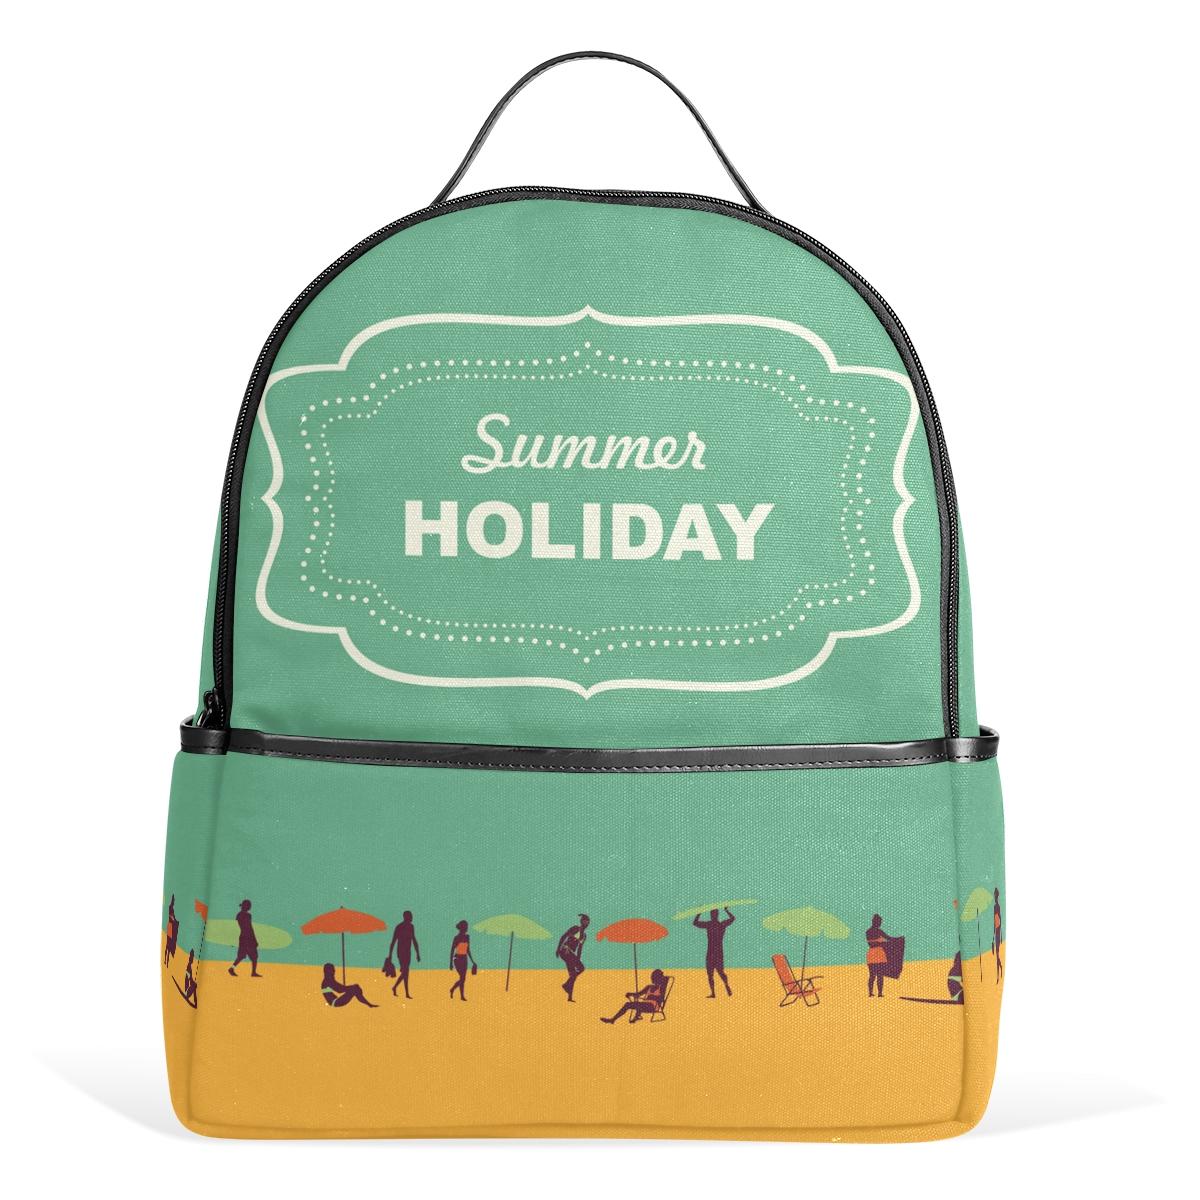 Fashion Women Backpack 2017 Shoulders Schoolbags Mini Girls Pink Mixed Color Travel Bags Landscape Series Mochila Feminina(China (Mainland))